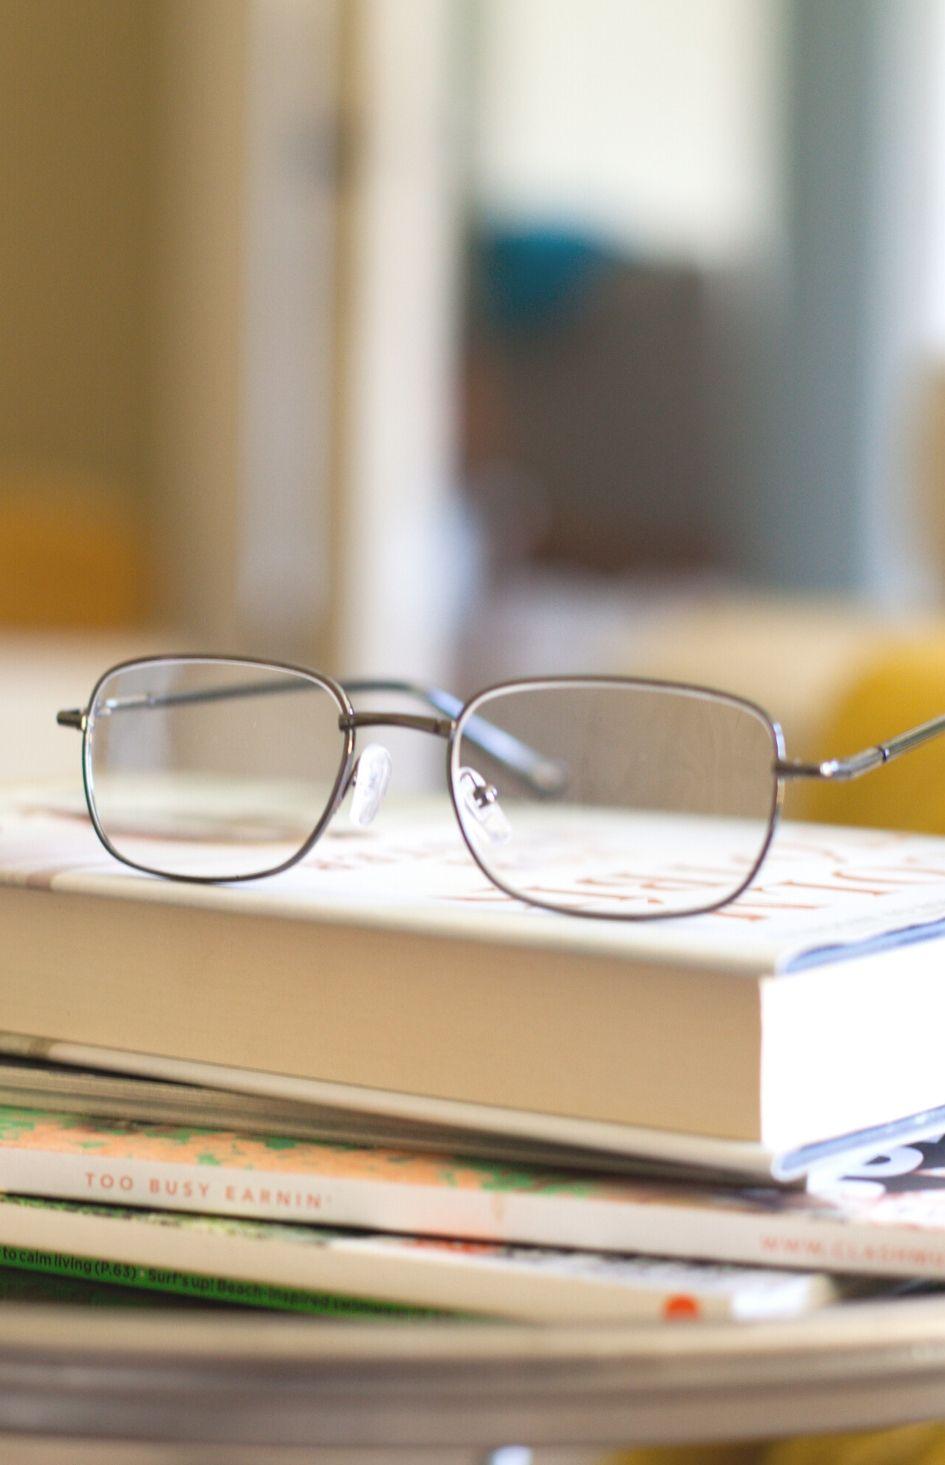 Matt Black Reading Glasses 2.5 Dioptre by Safe+Sound Health